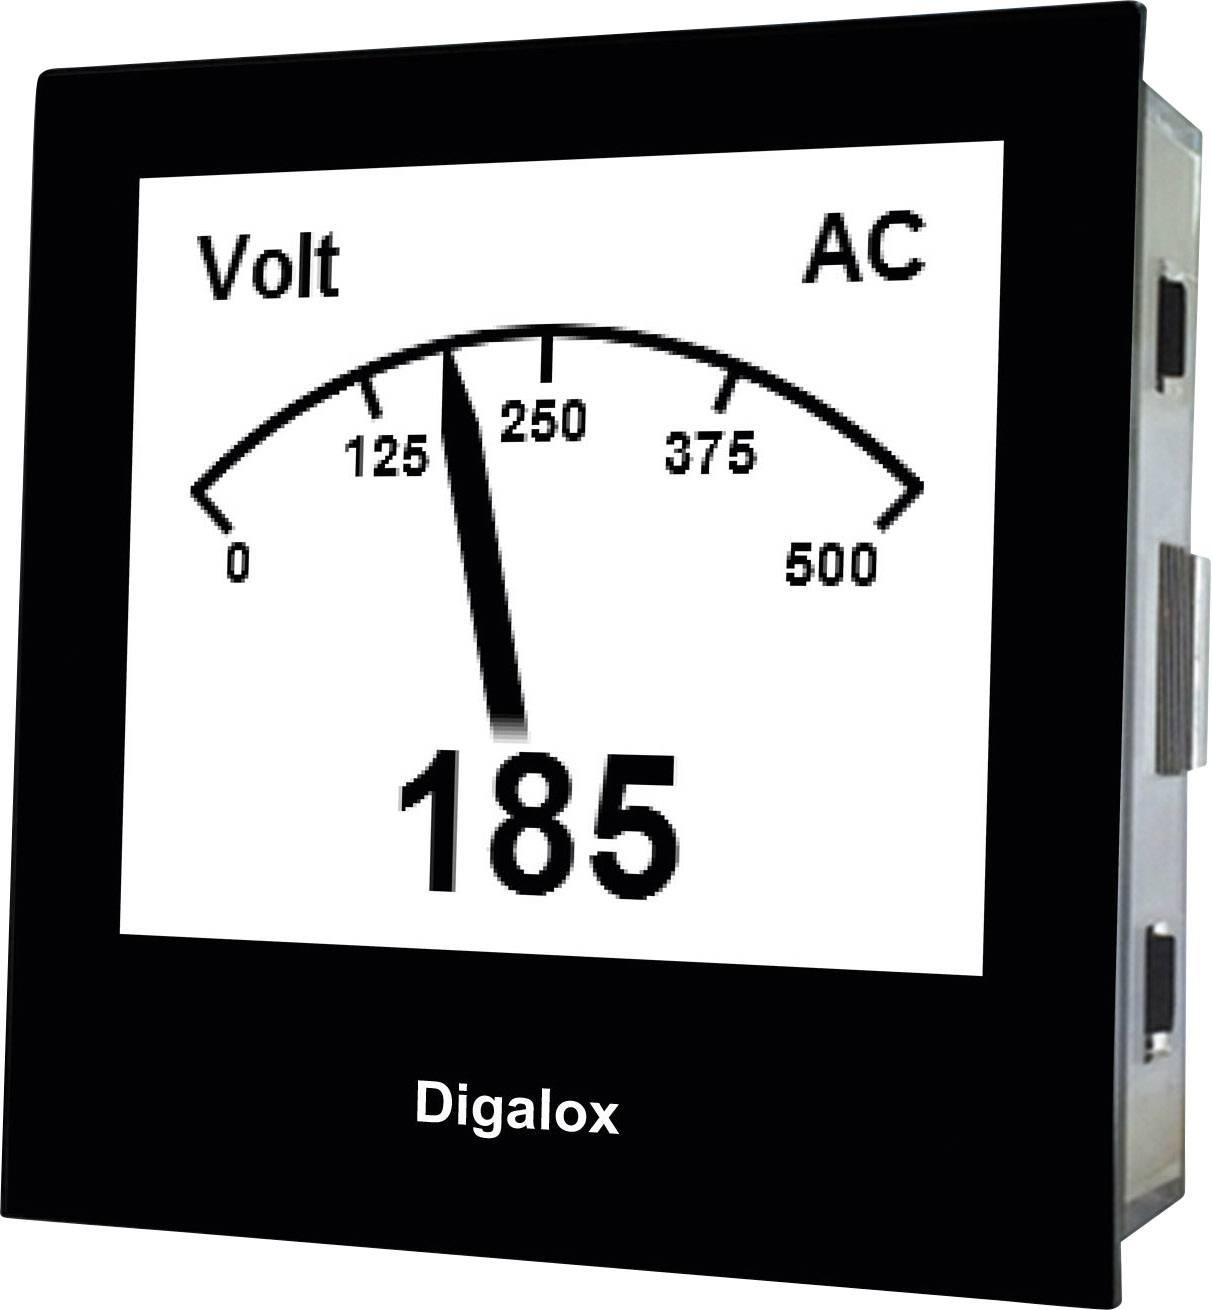 TDE Instruments Digalox DPM72-AVP digitalni ugradbeni mjerni uređaj